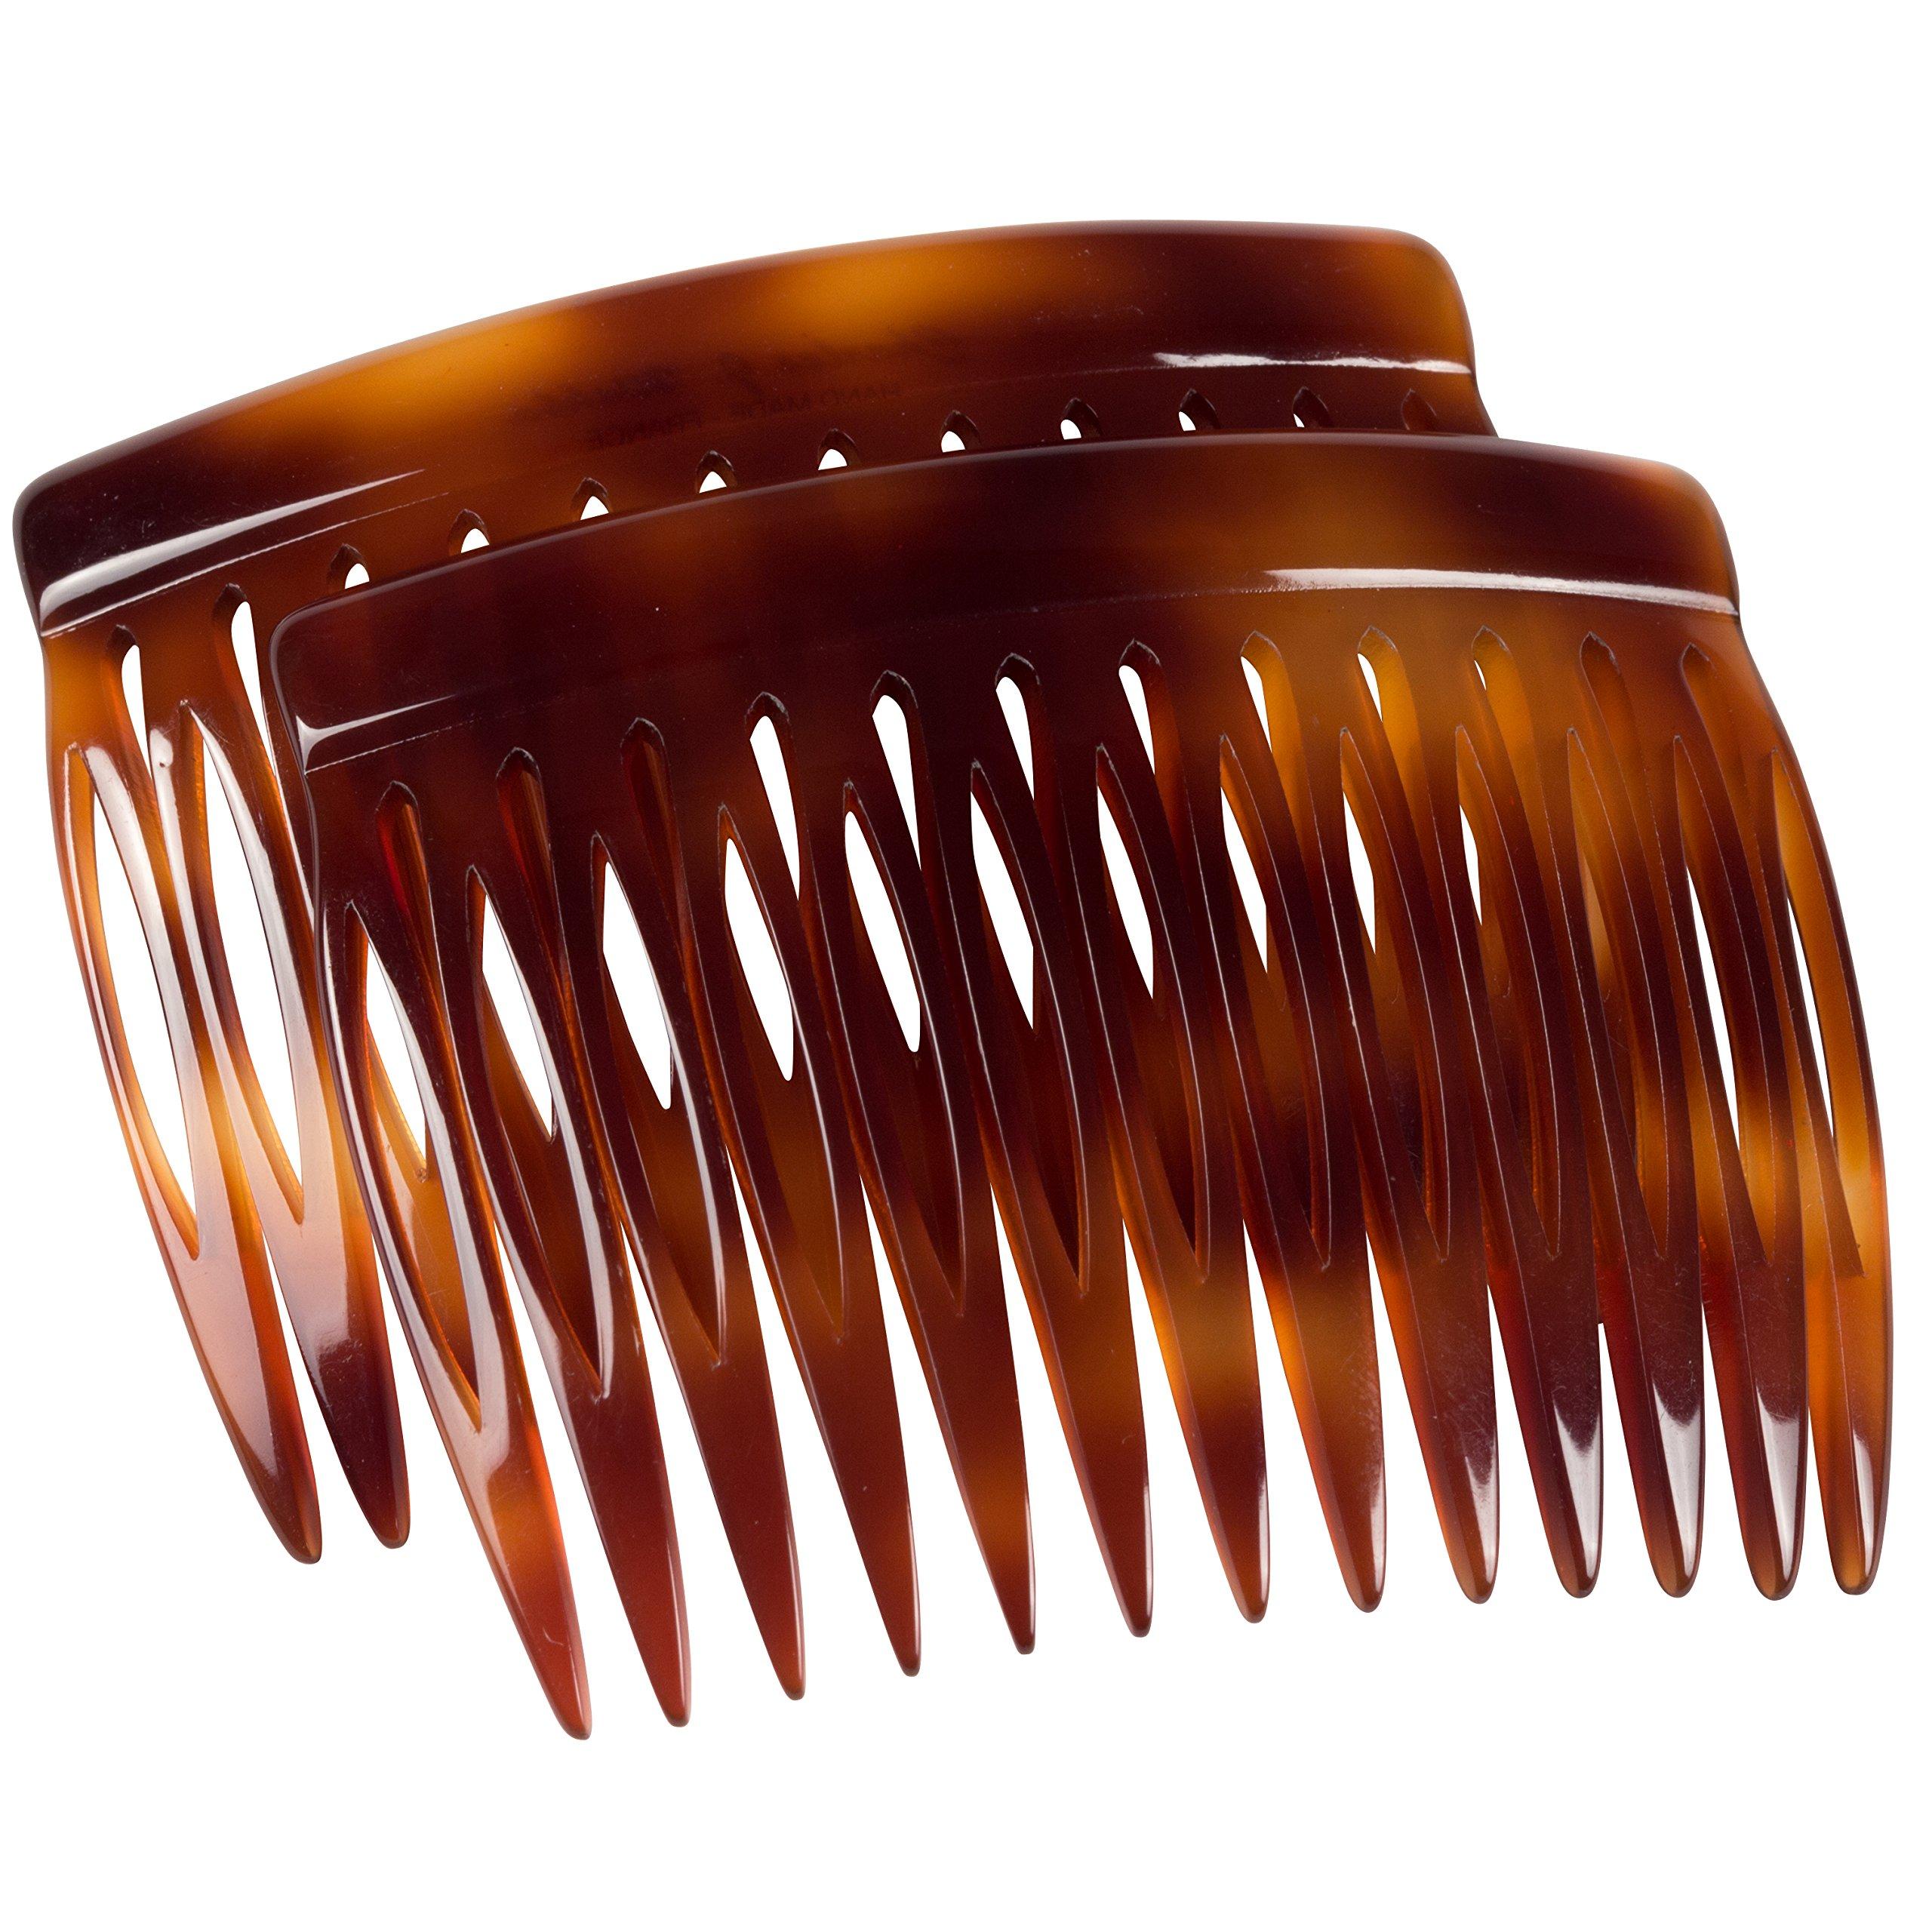 Charles J. Wahba Side Comb Pairs - 13 Teeth (Mock Tortoise Color) Handmade in France by Charles J. Wahba